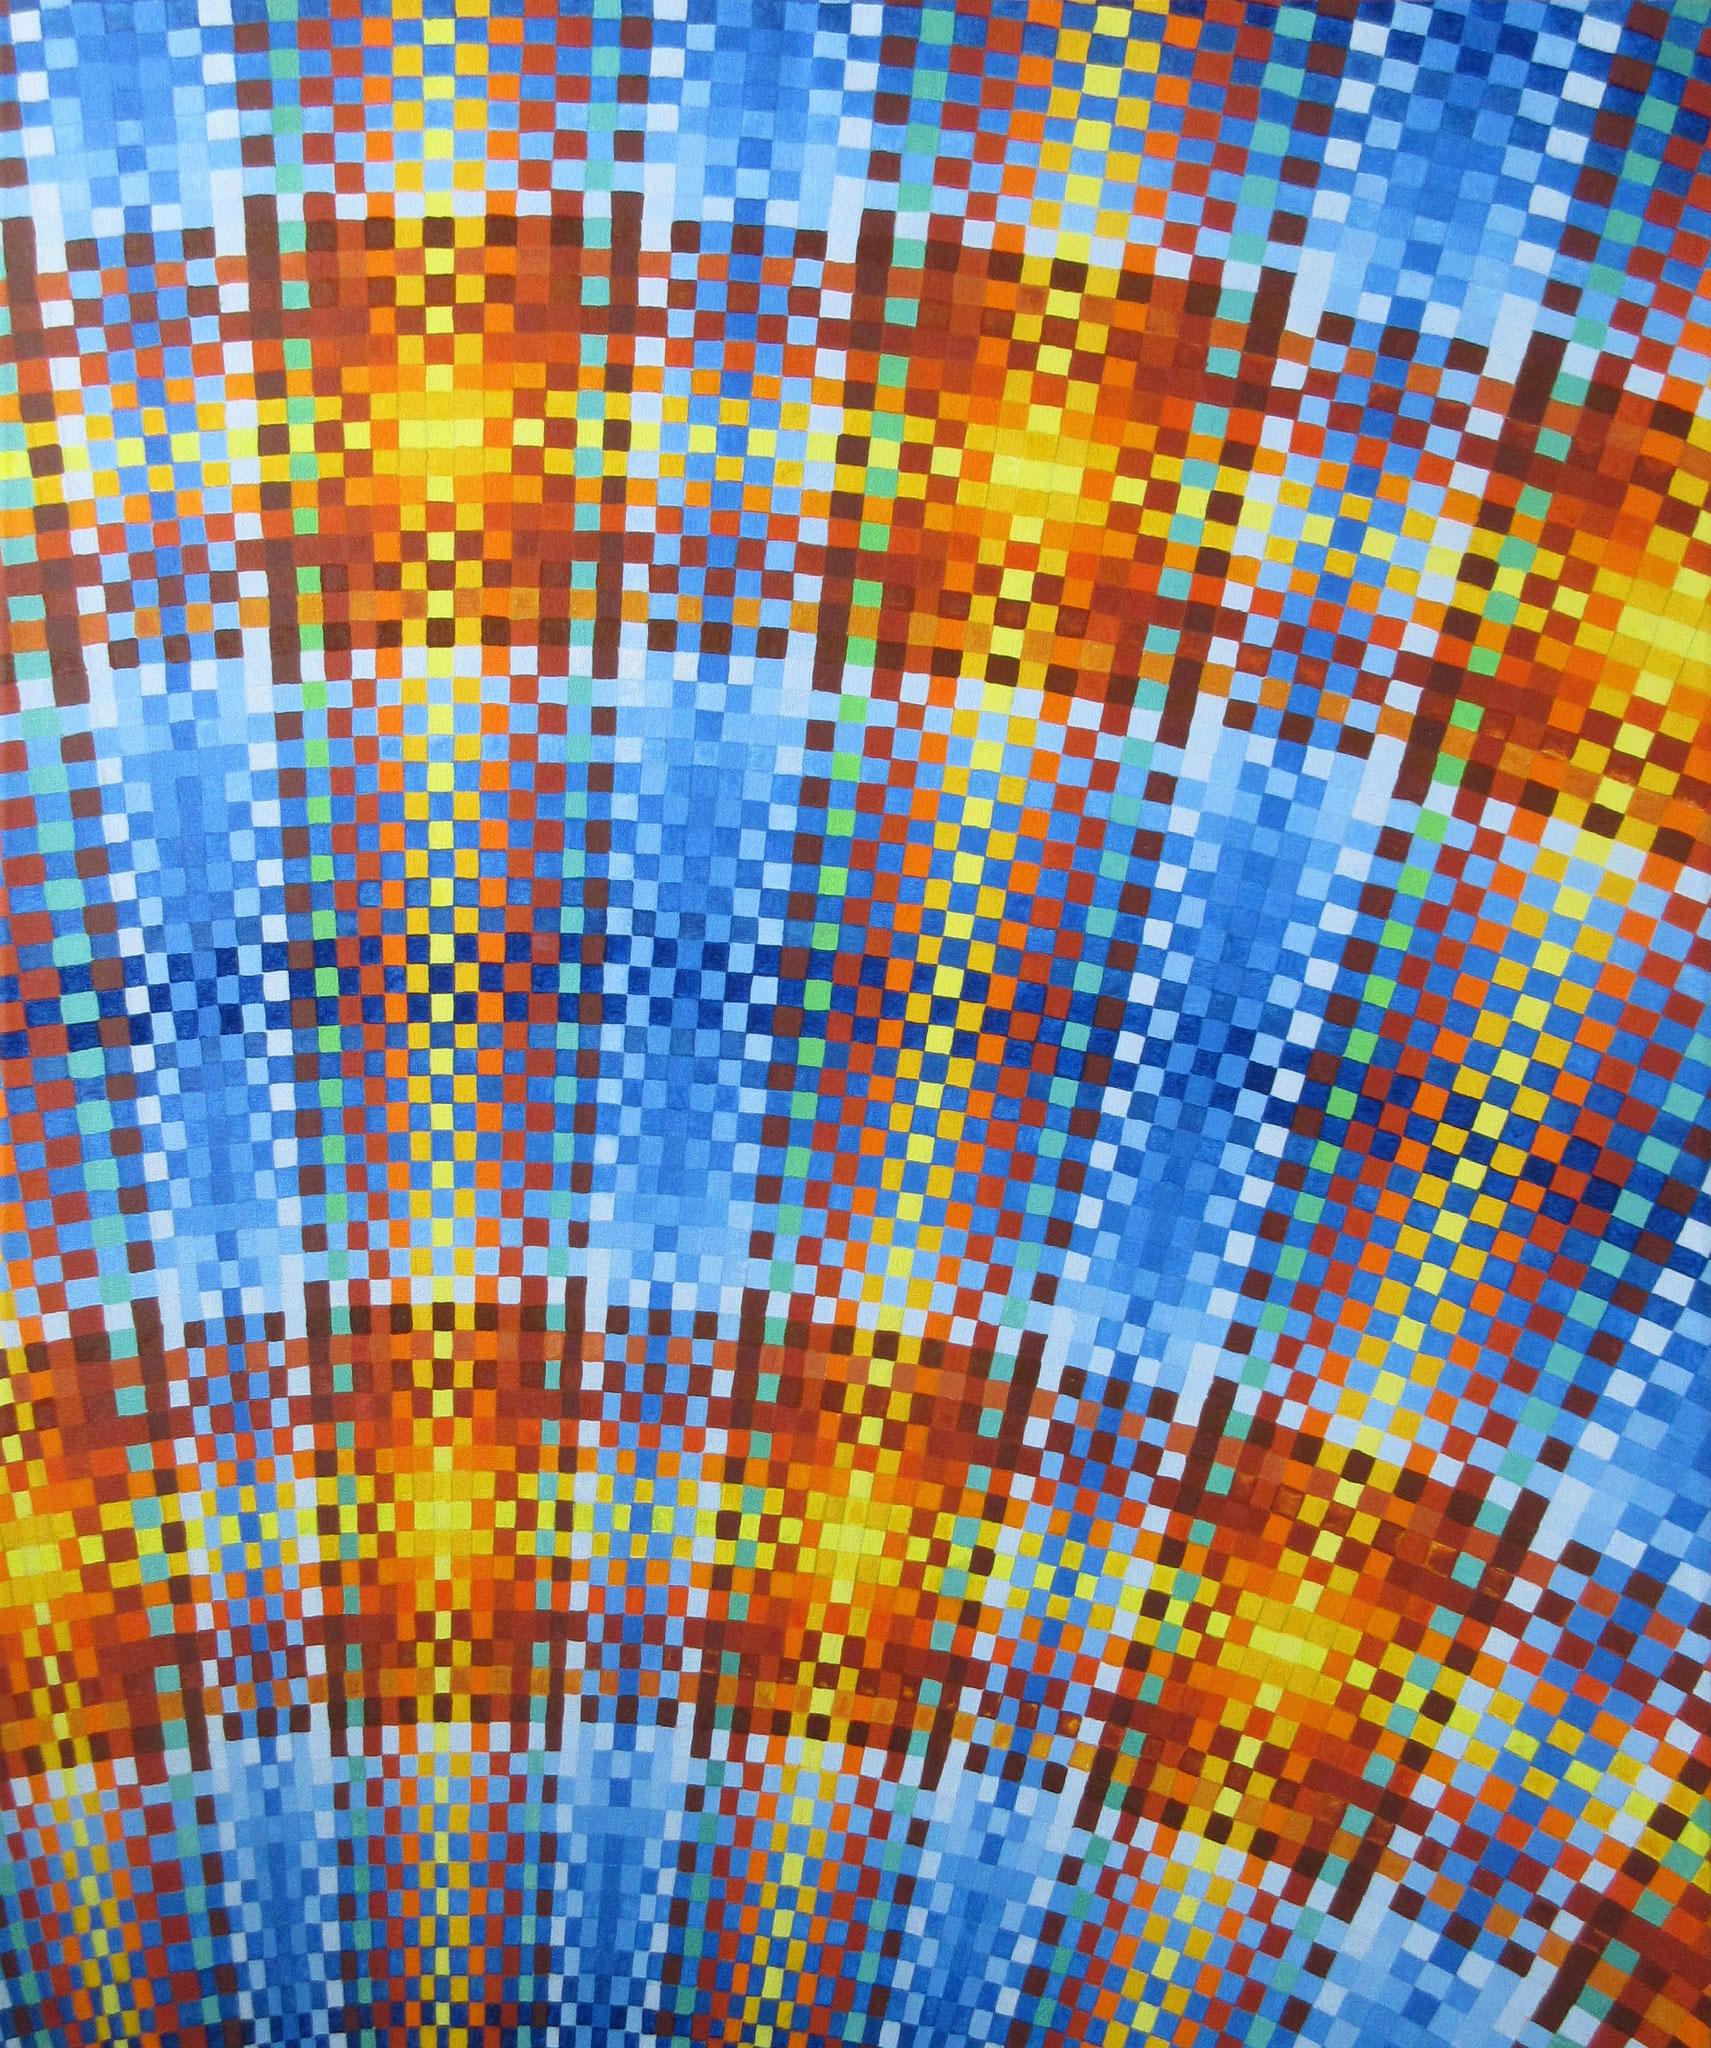 "#451 - ""Fabric of Life III"", oil on canvas 30x36, Feb.2018 (7)"